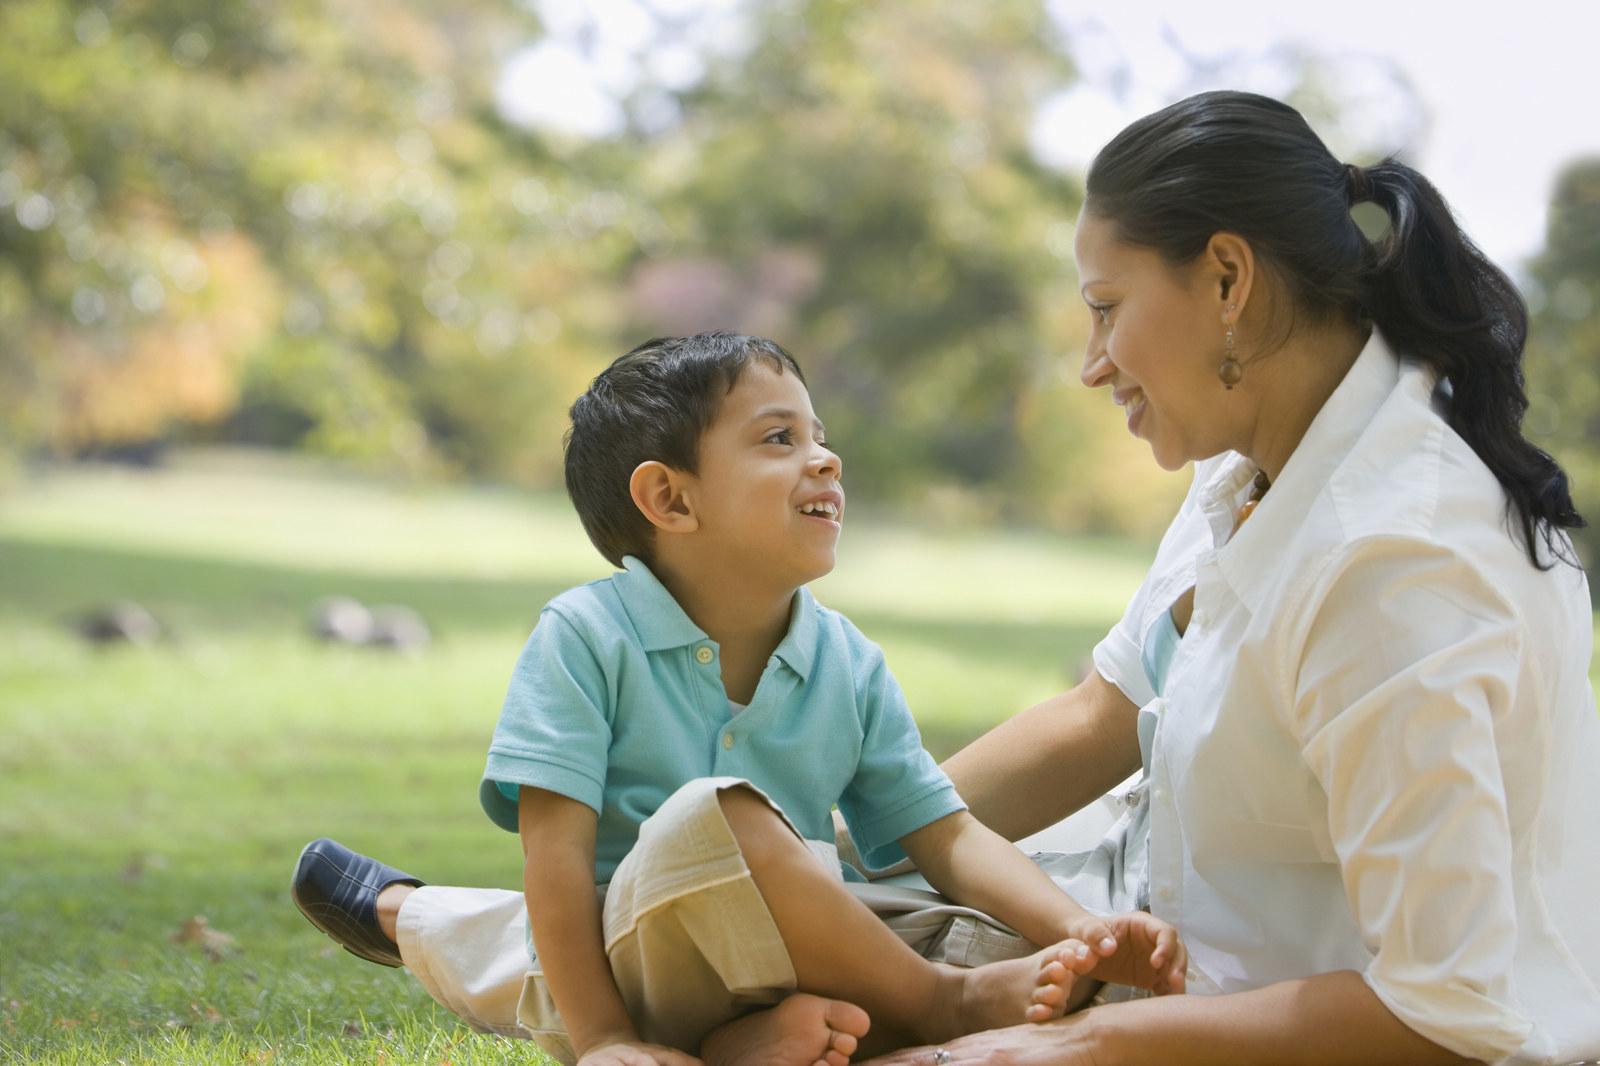 A parent's guide for raising spiritually mature teenagers